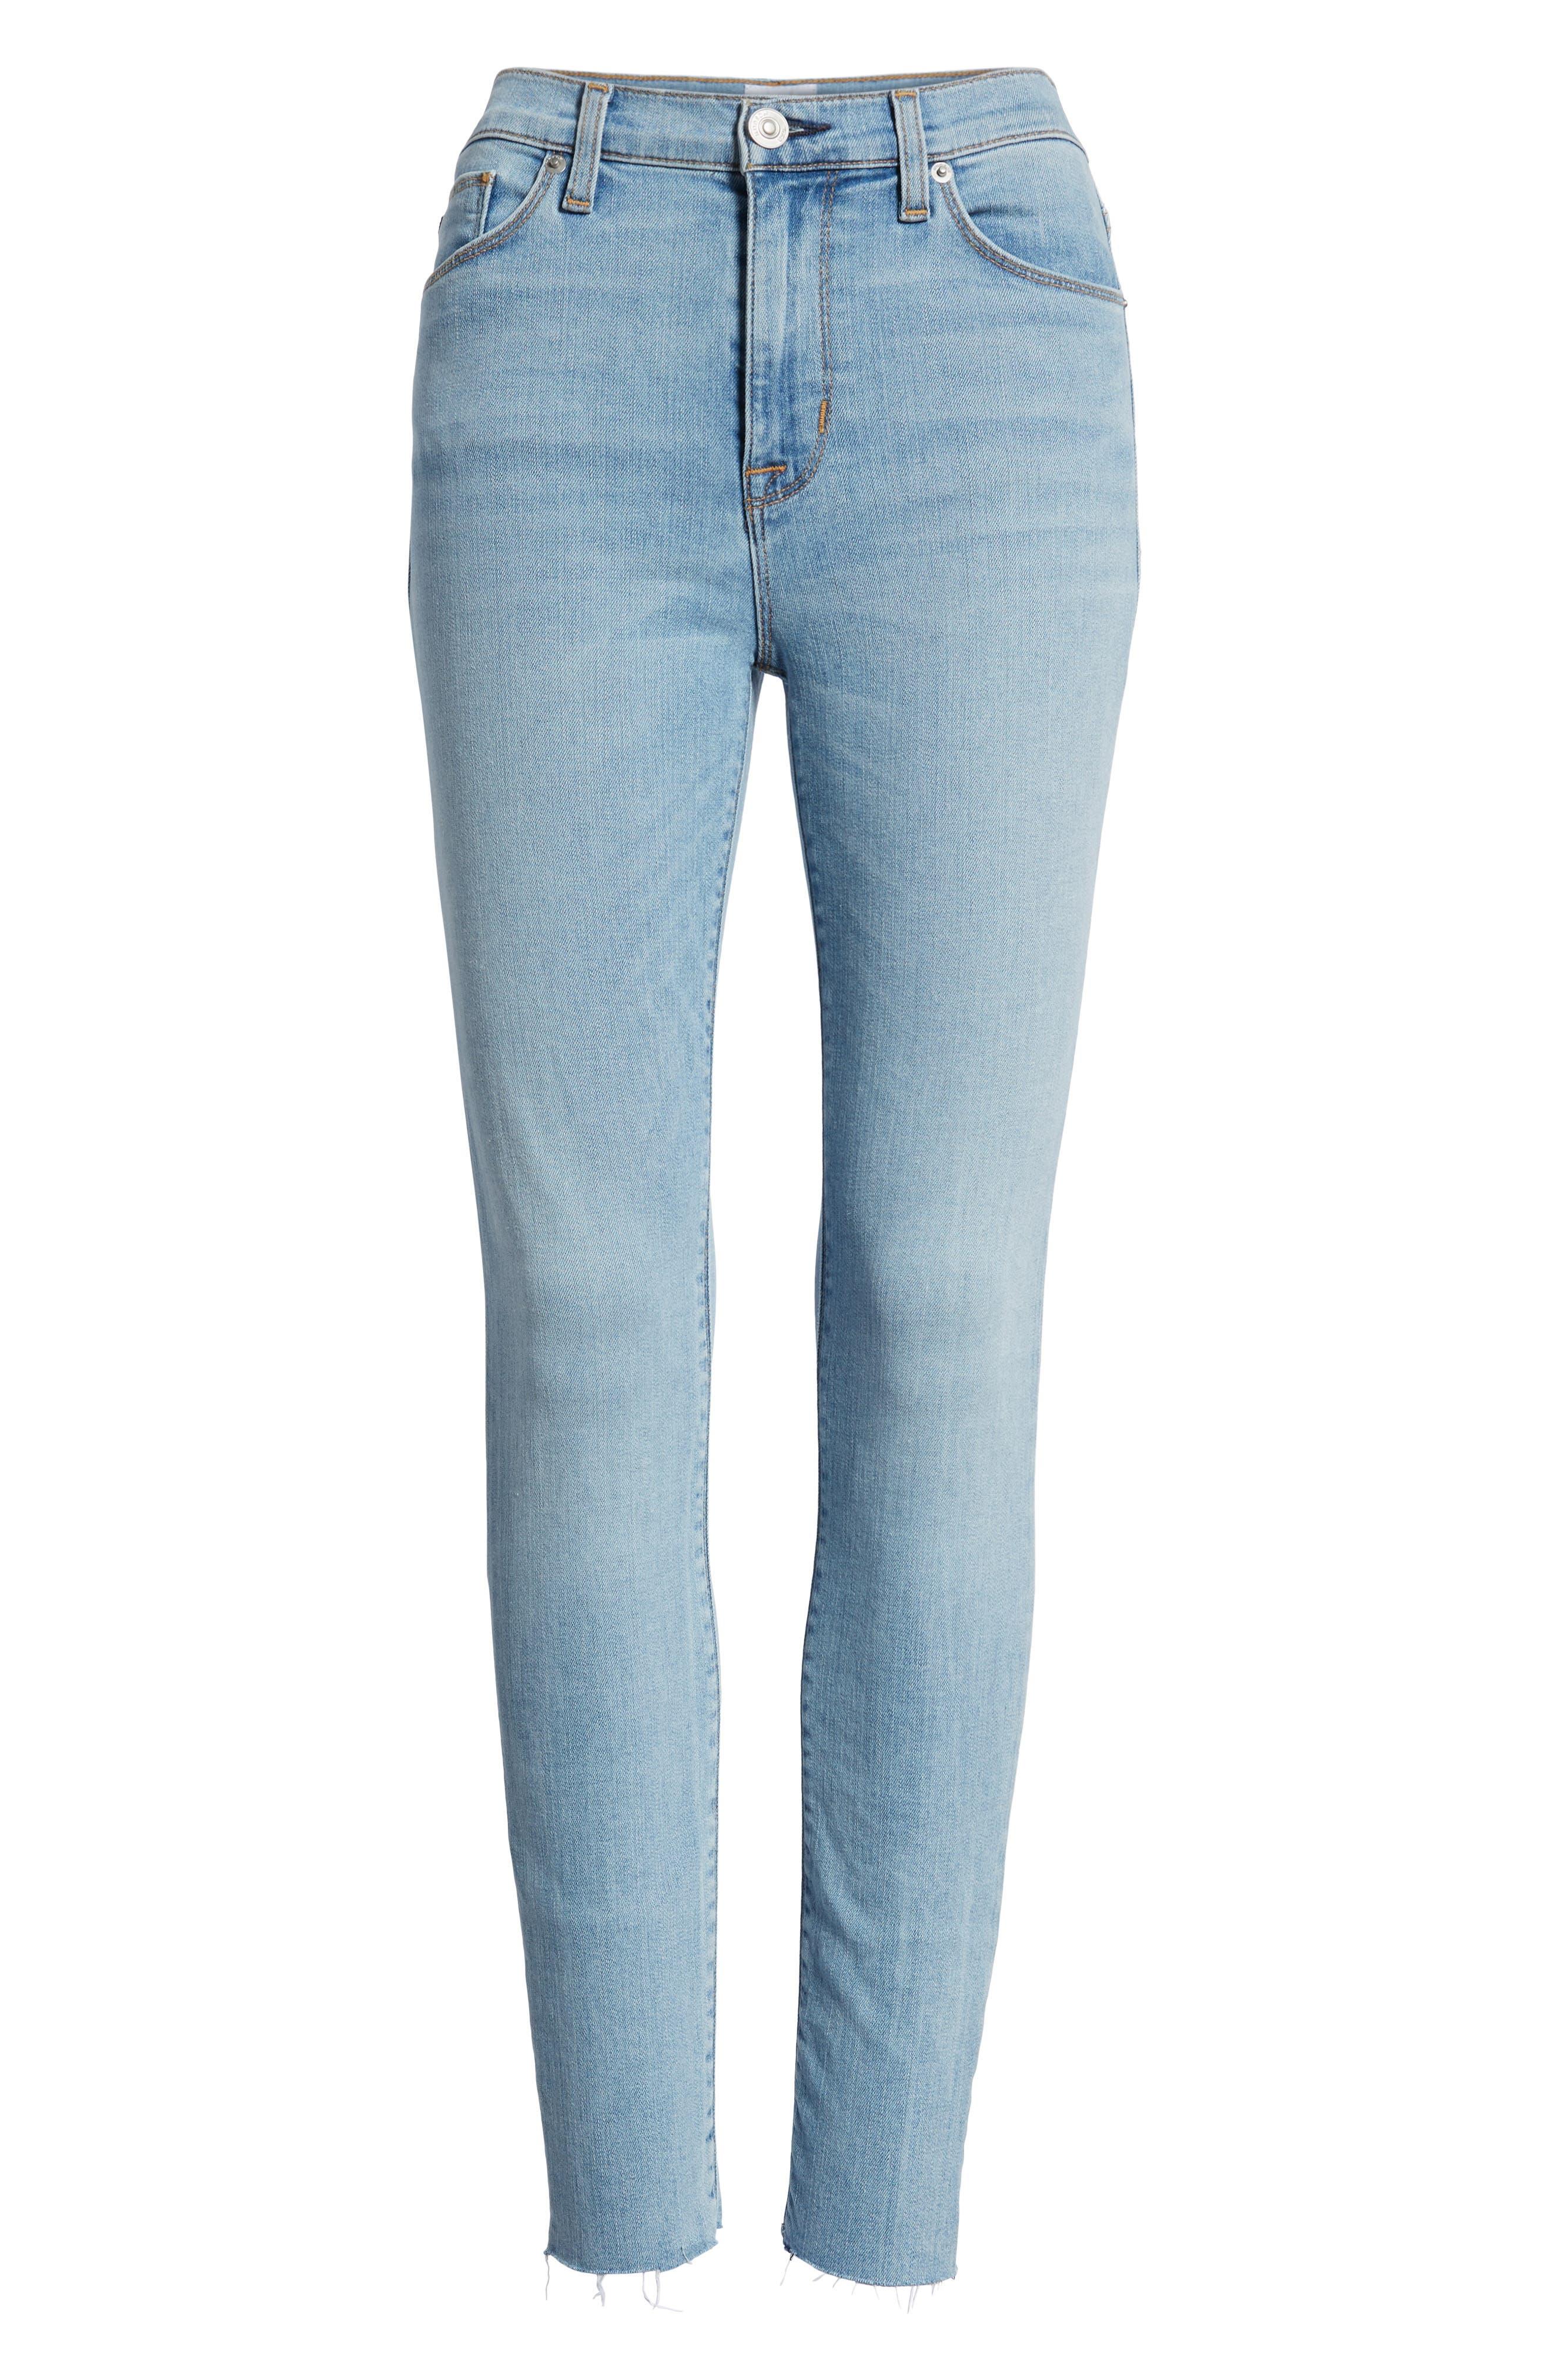 Hudson Barbara High Waist Ankle Skinny Jeans,                             Alternate thumbnail 7, color,                             Gemini